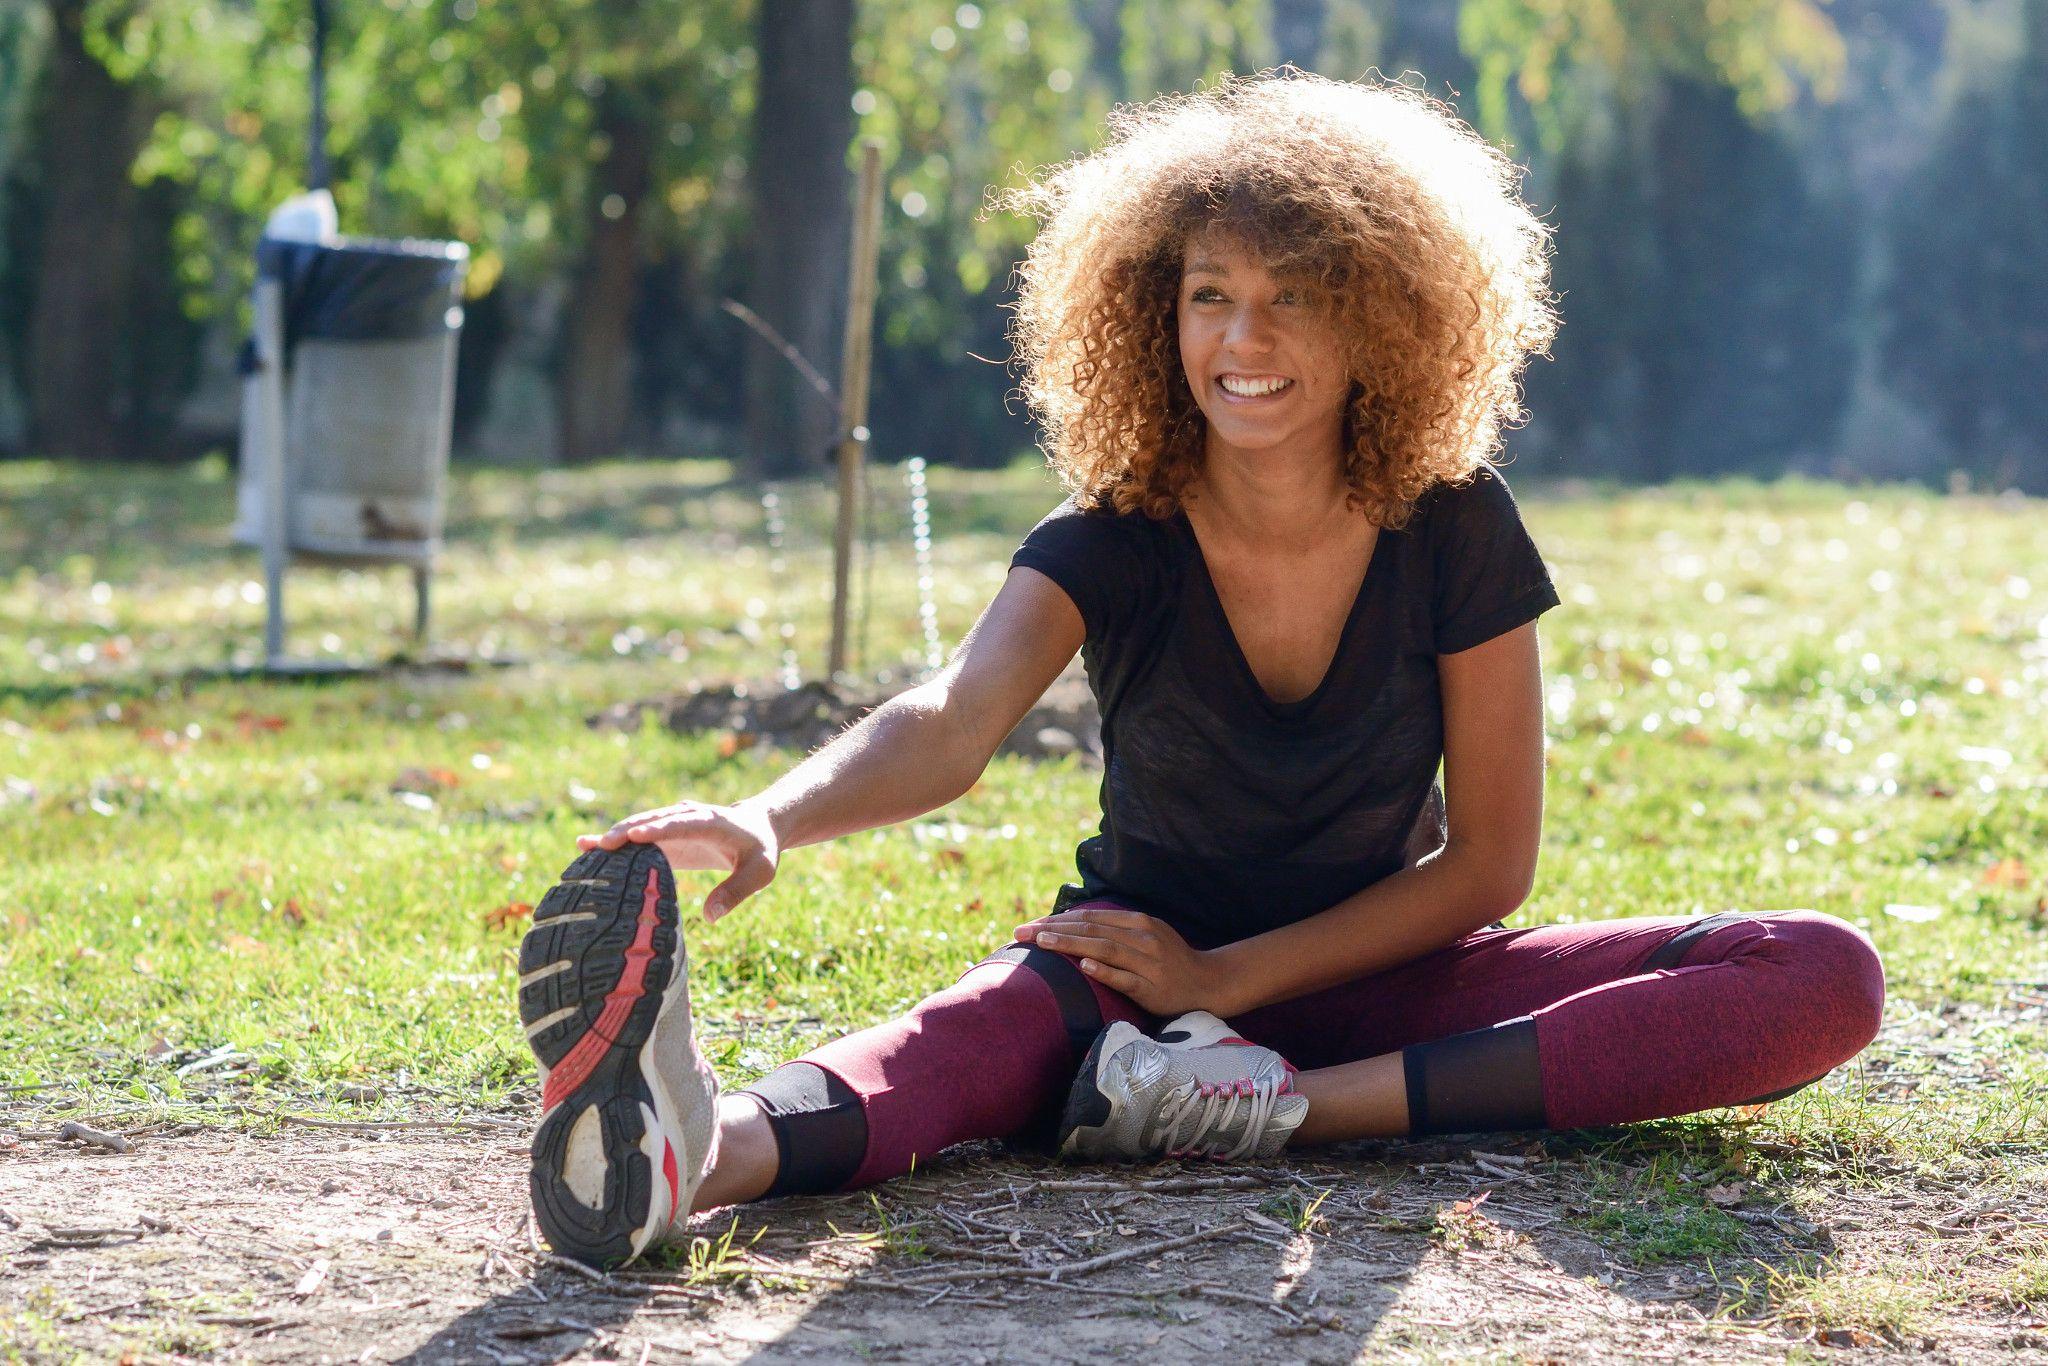 Woman doing a forward fold at the park